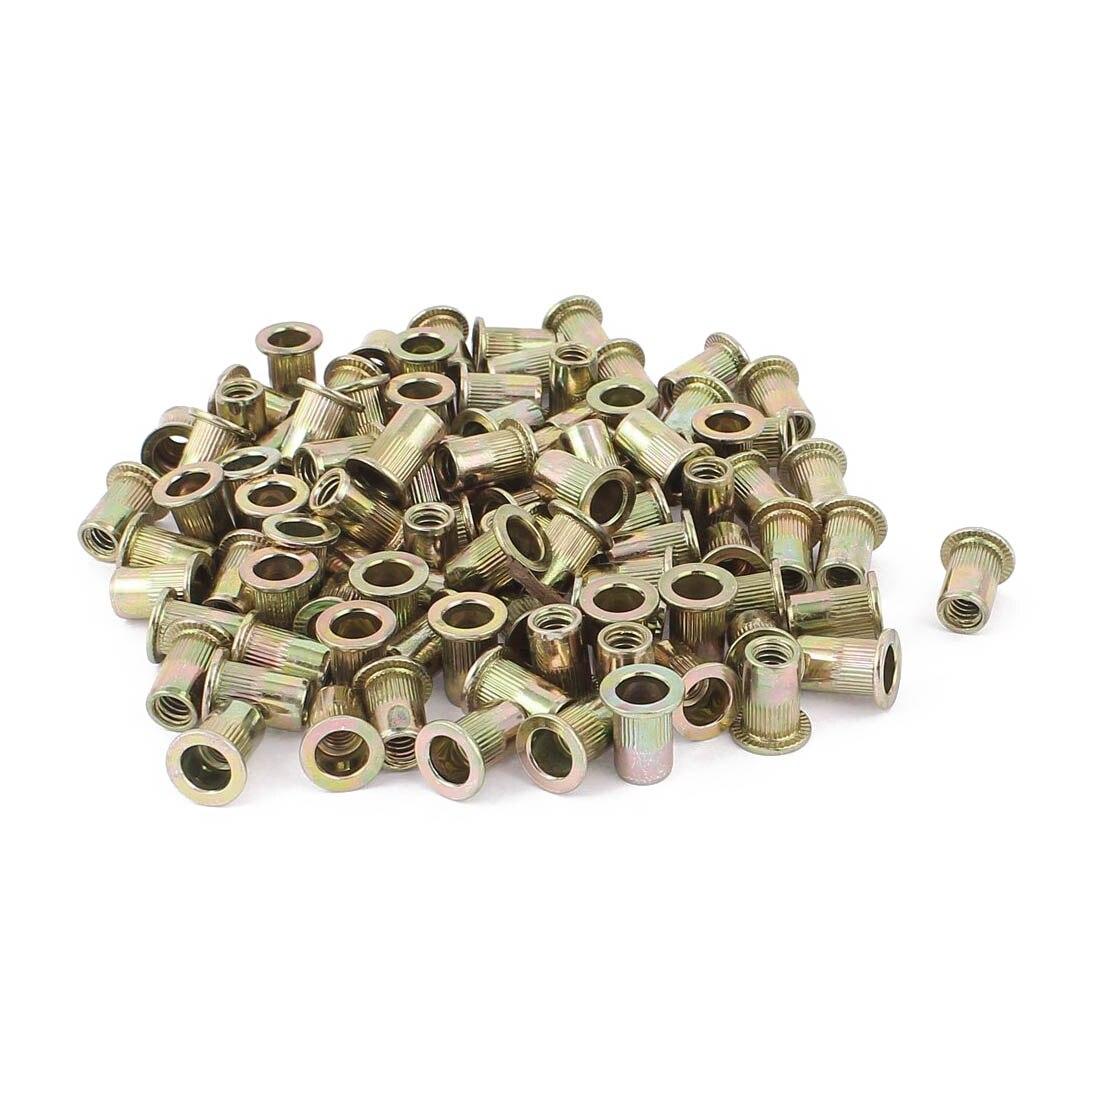 100 Pcs Zinc Plated Carbon Steel Rivet Nut Flat Head Insert Nuts 1/4-20UNC  Nuts Insert Reveting Rivet Nuts Collocation